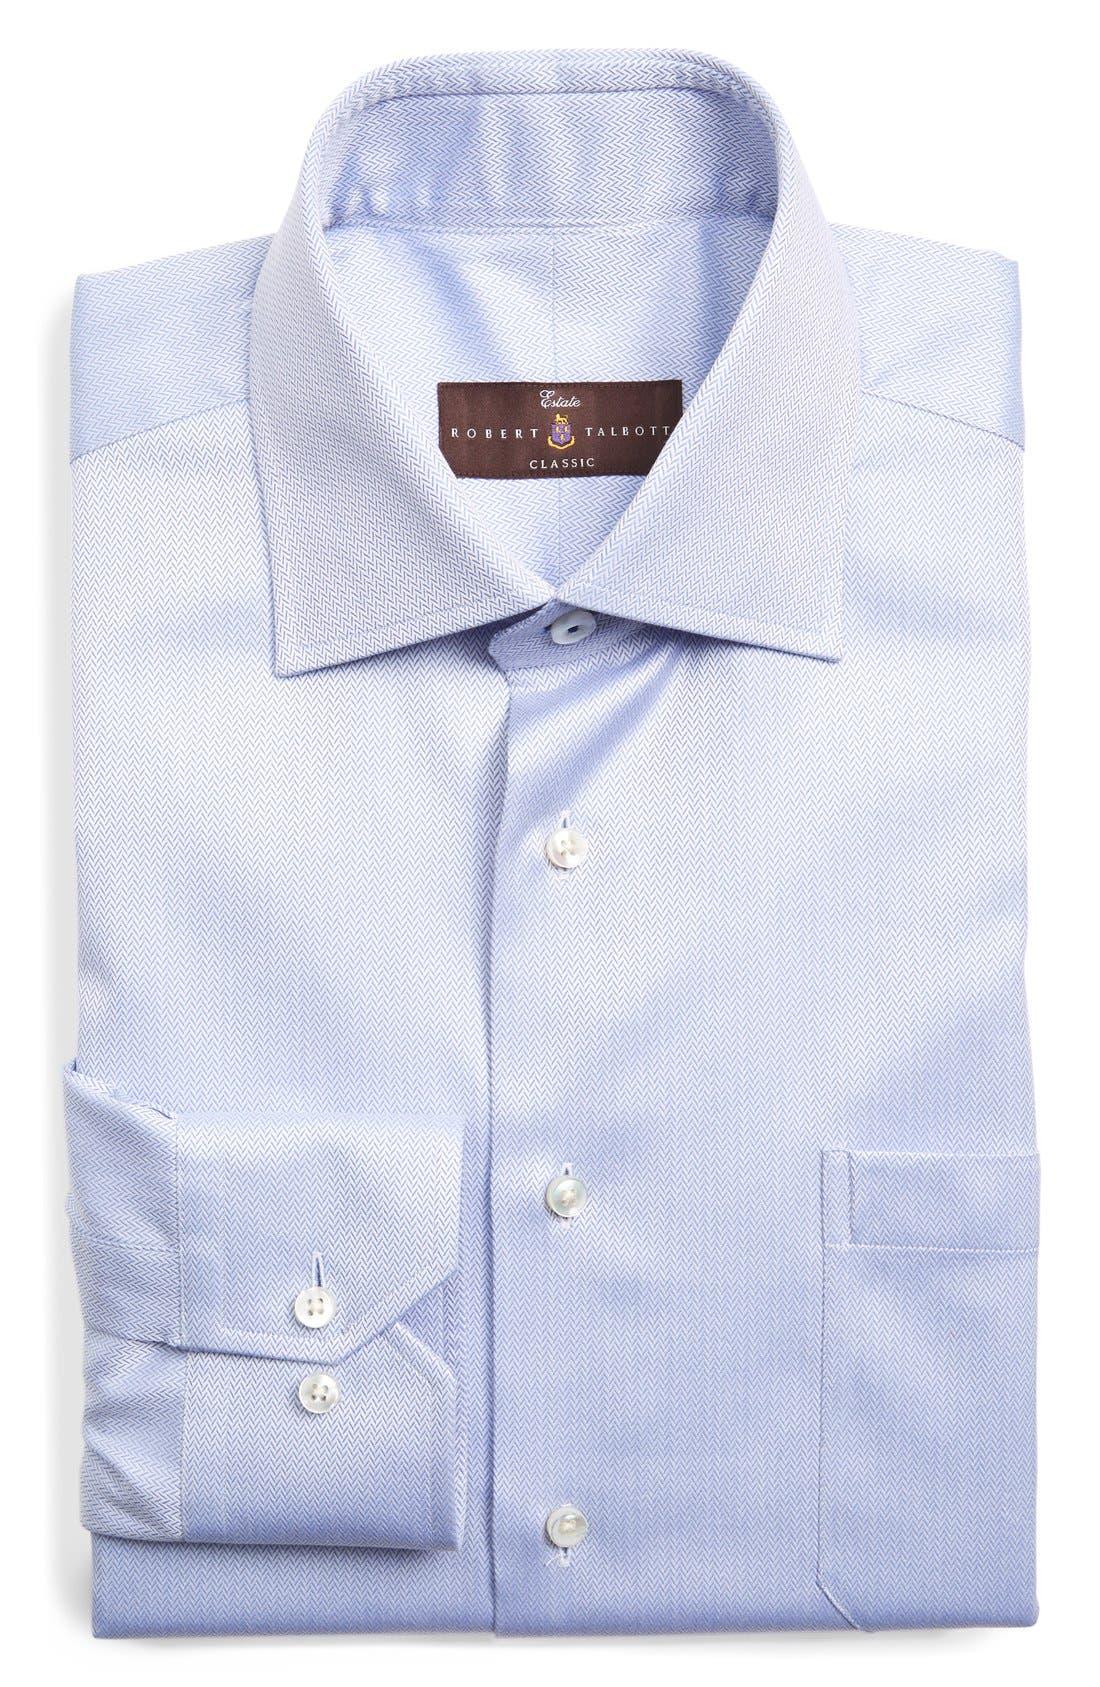 Classic Fit Dress Shirt,                         Main,                         color, 450